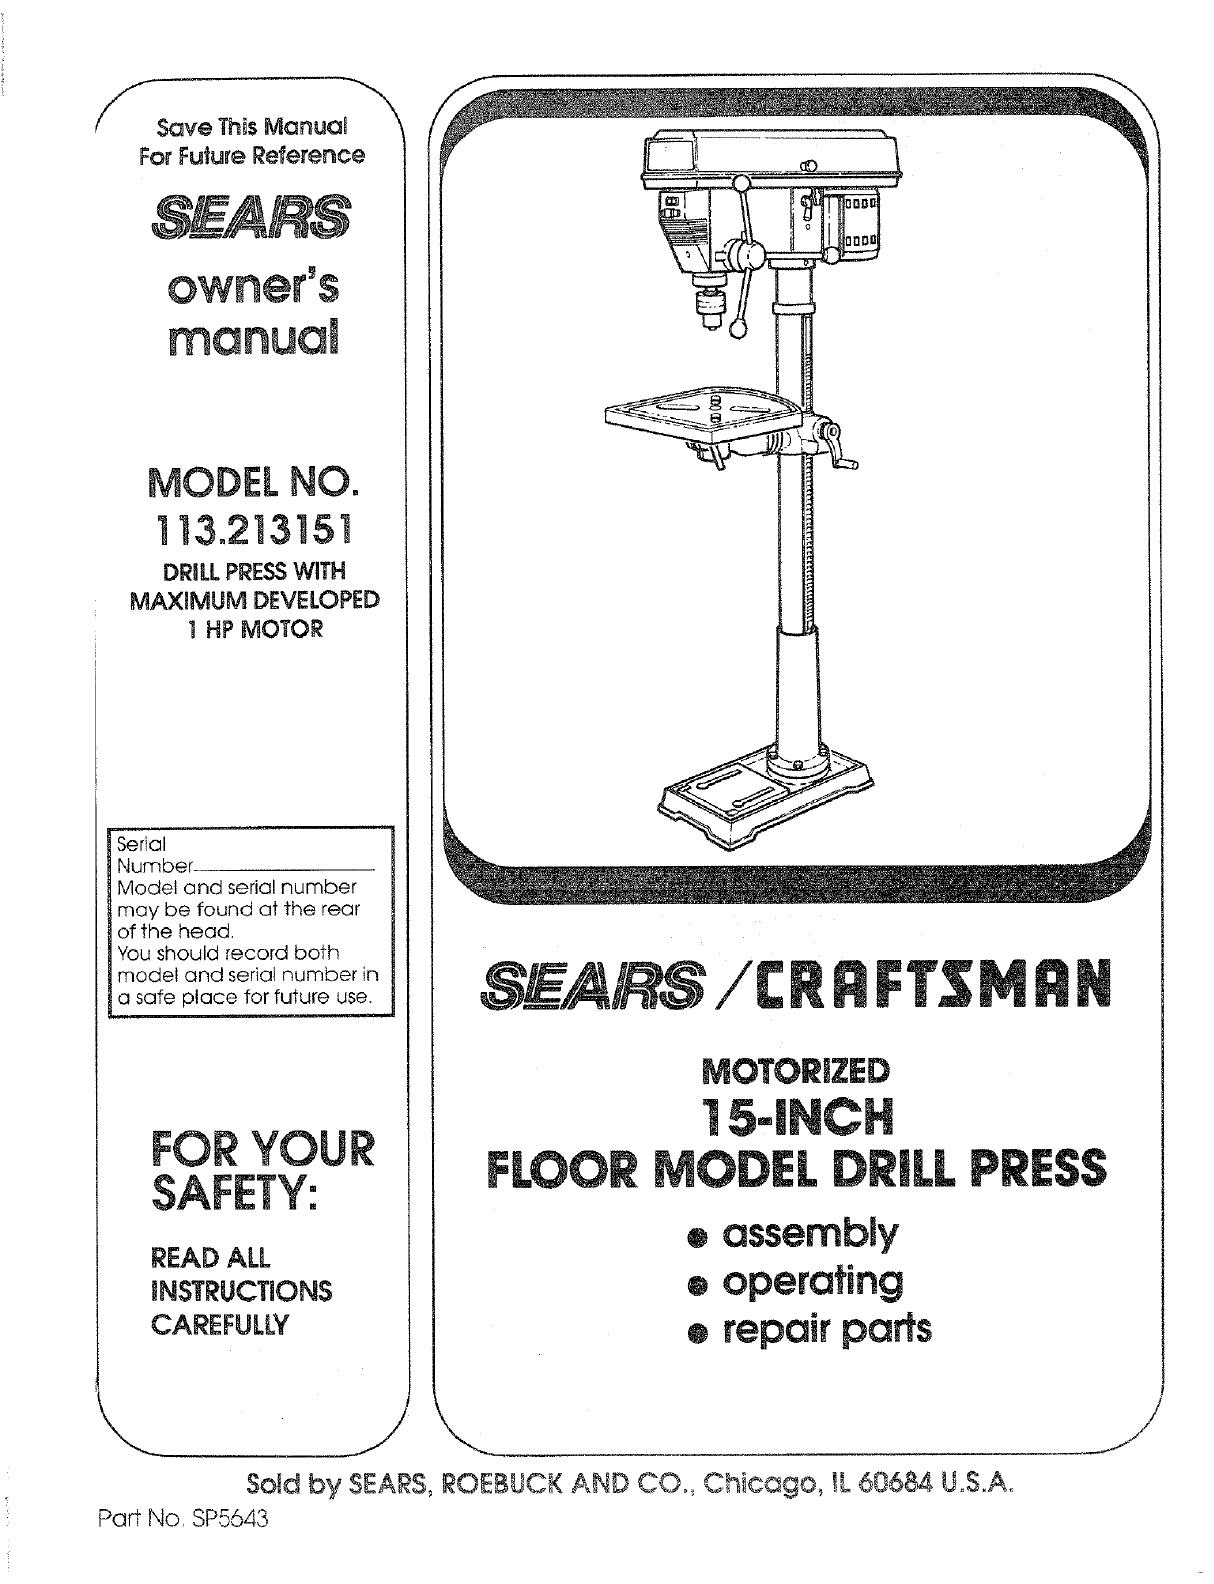 Drill Press Wiring Diagram - Wiring Diagram General